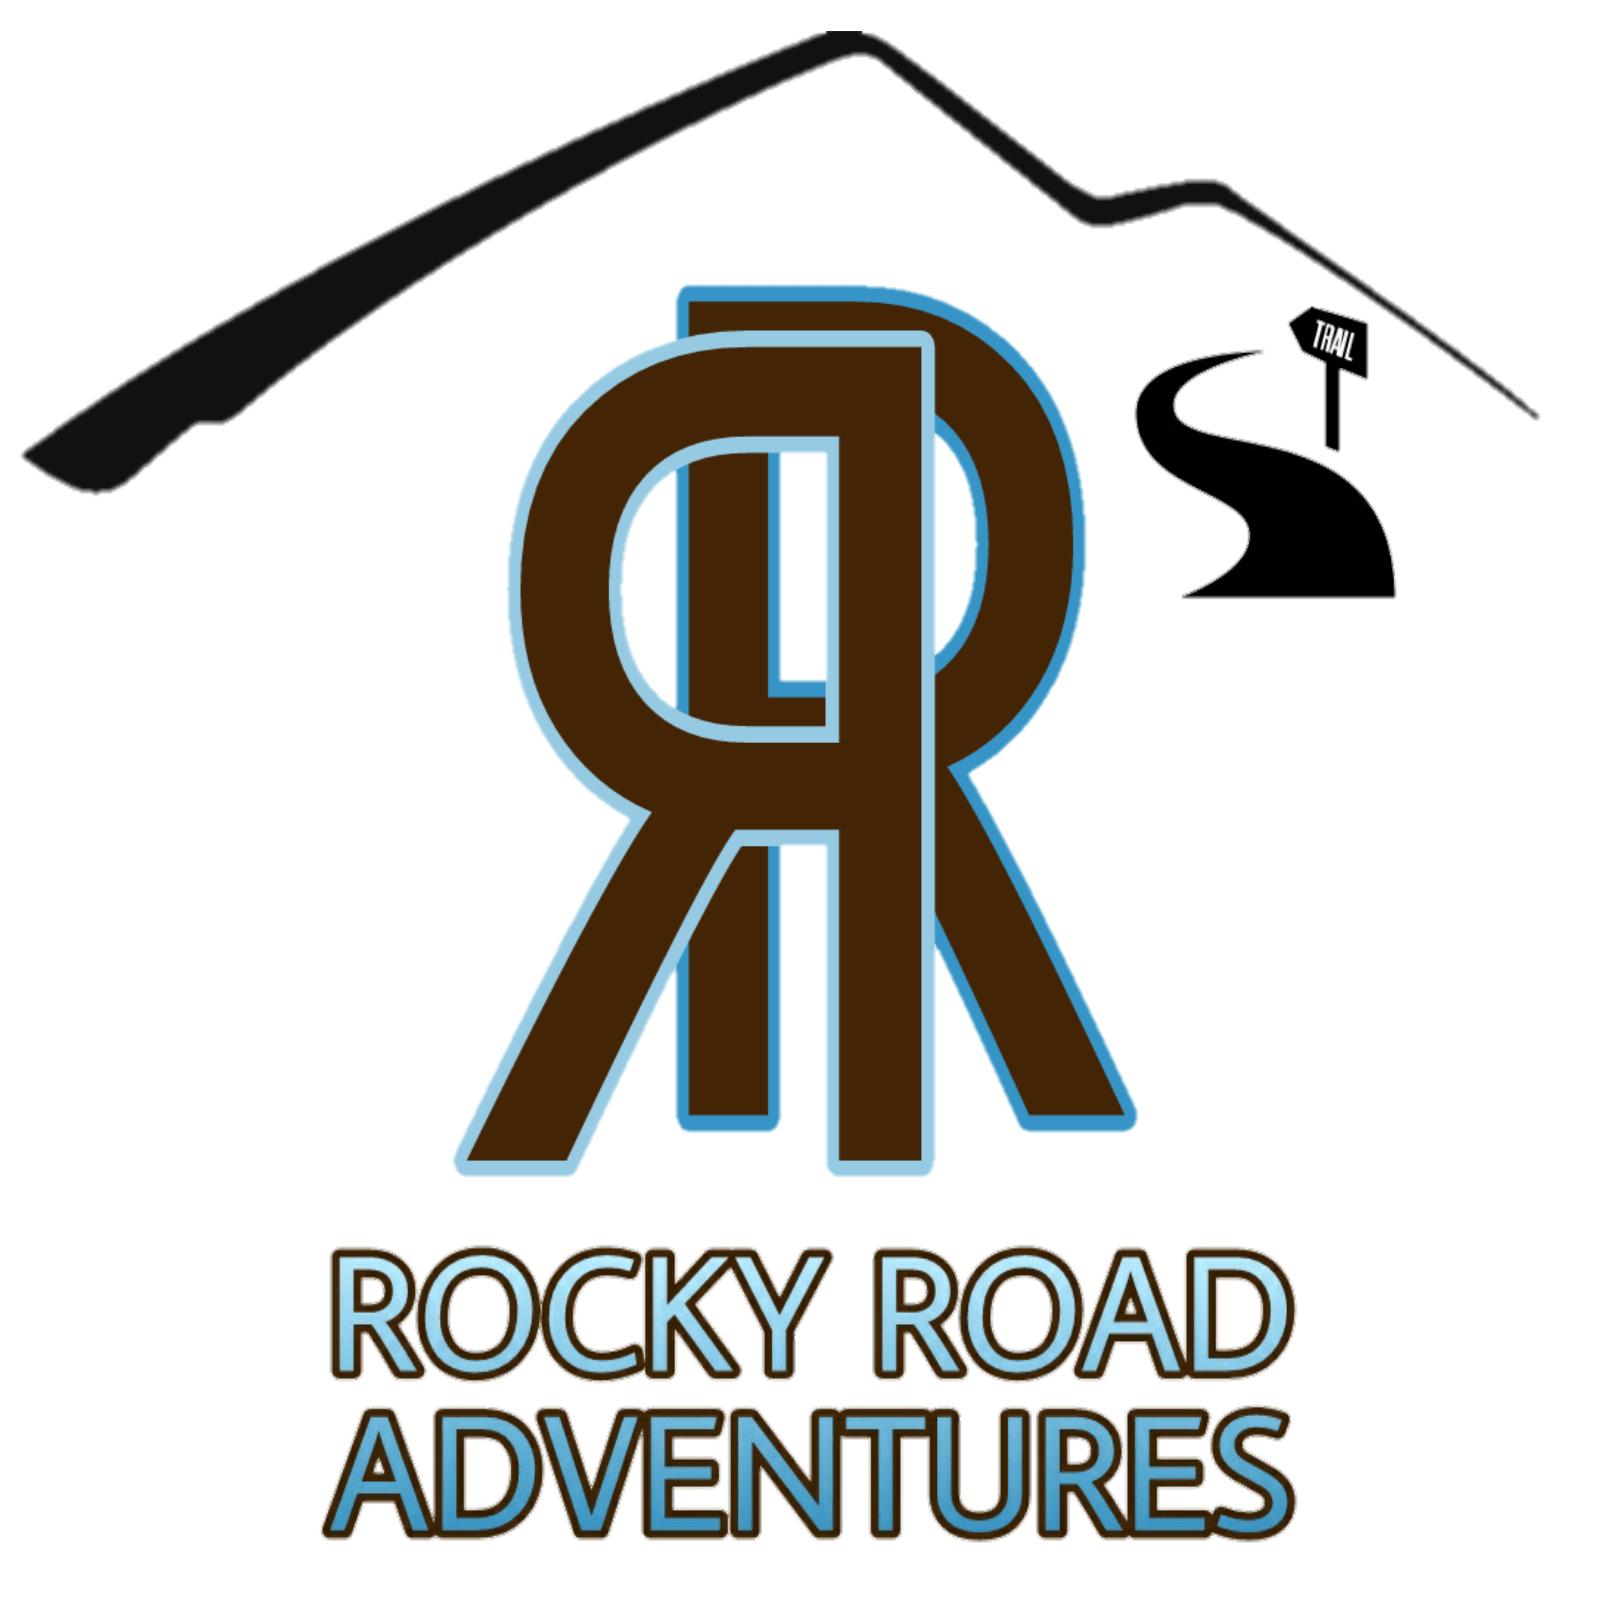 ROCKY ROAD ADVENTURES